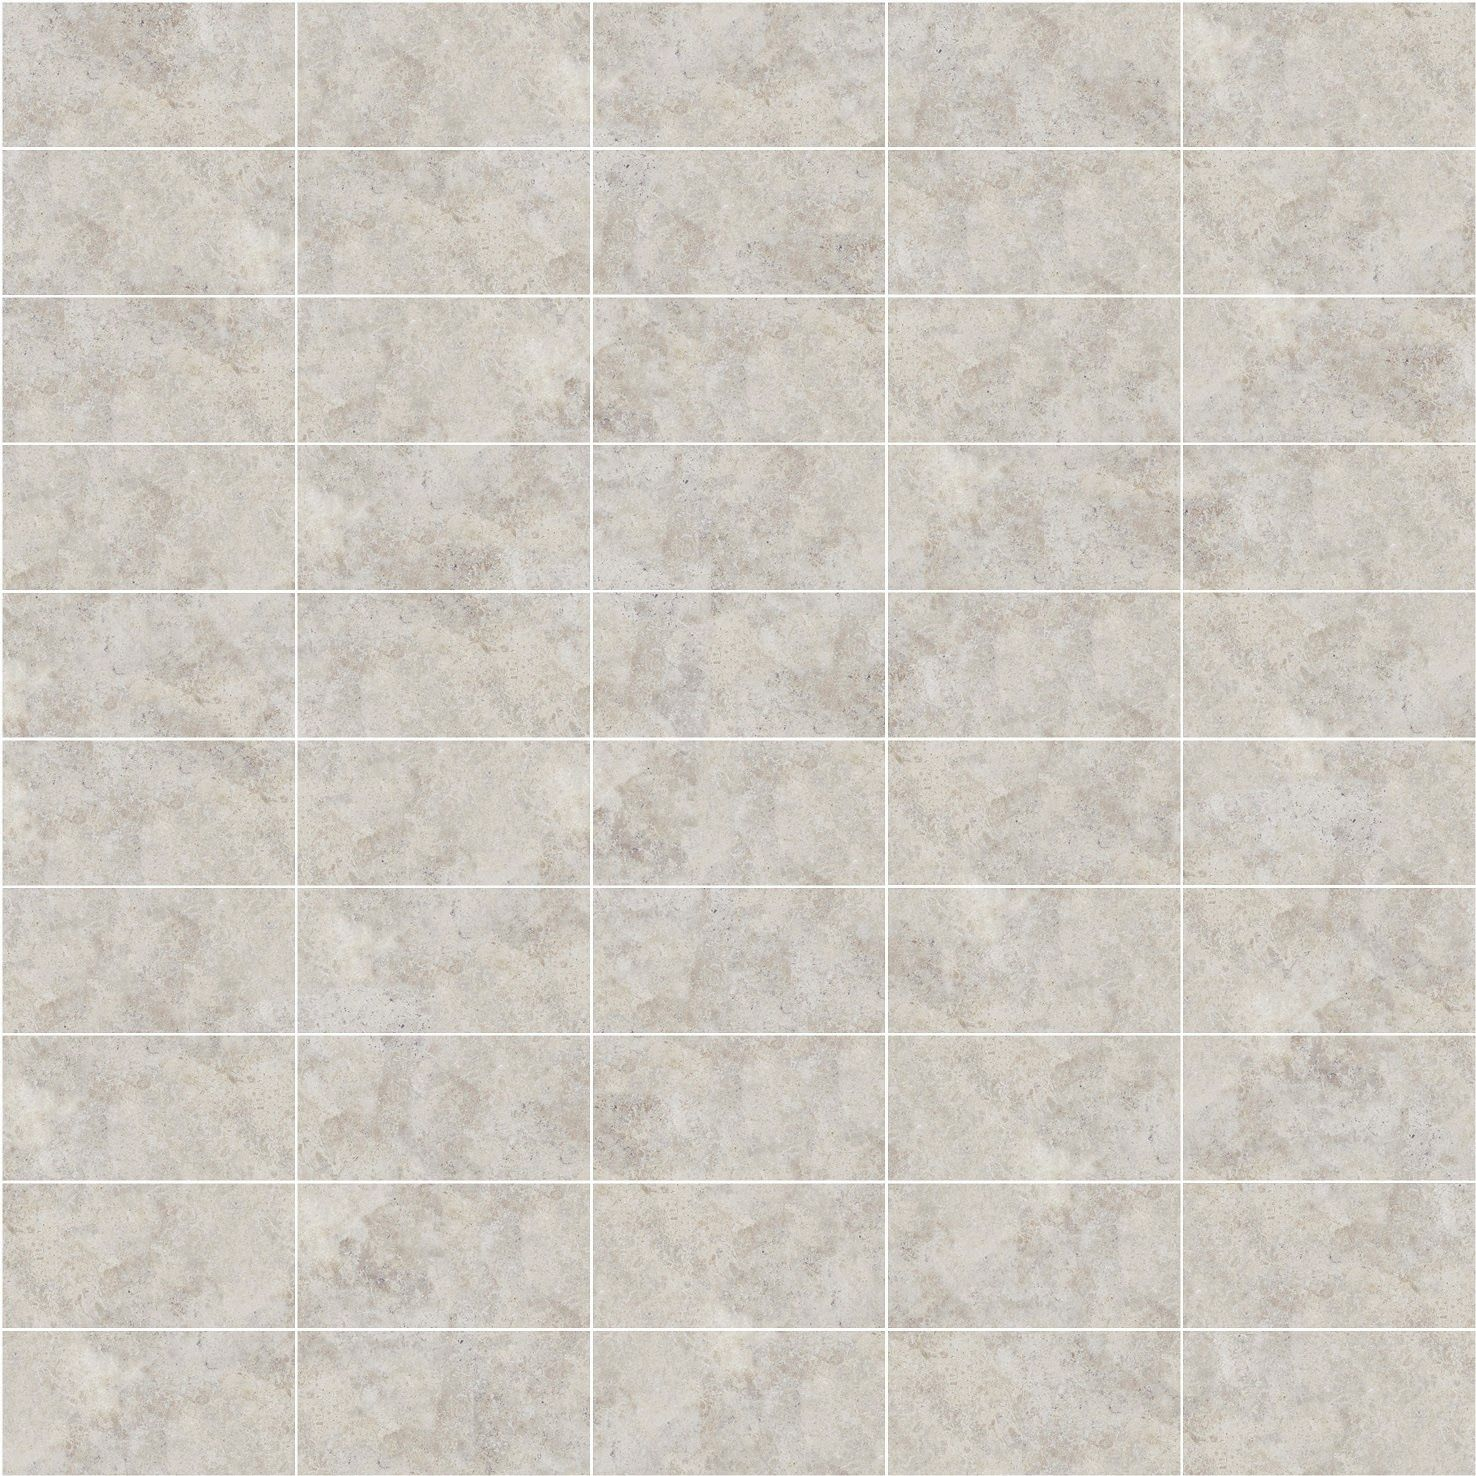 Texture seamless marble floor tile Pavimentare a